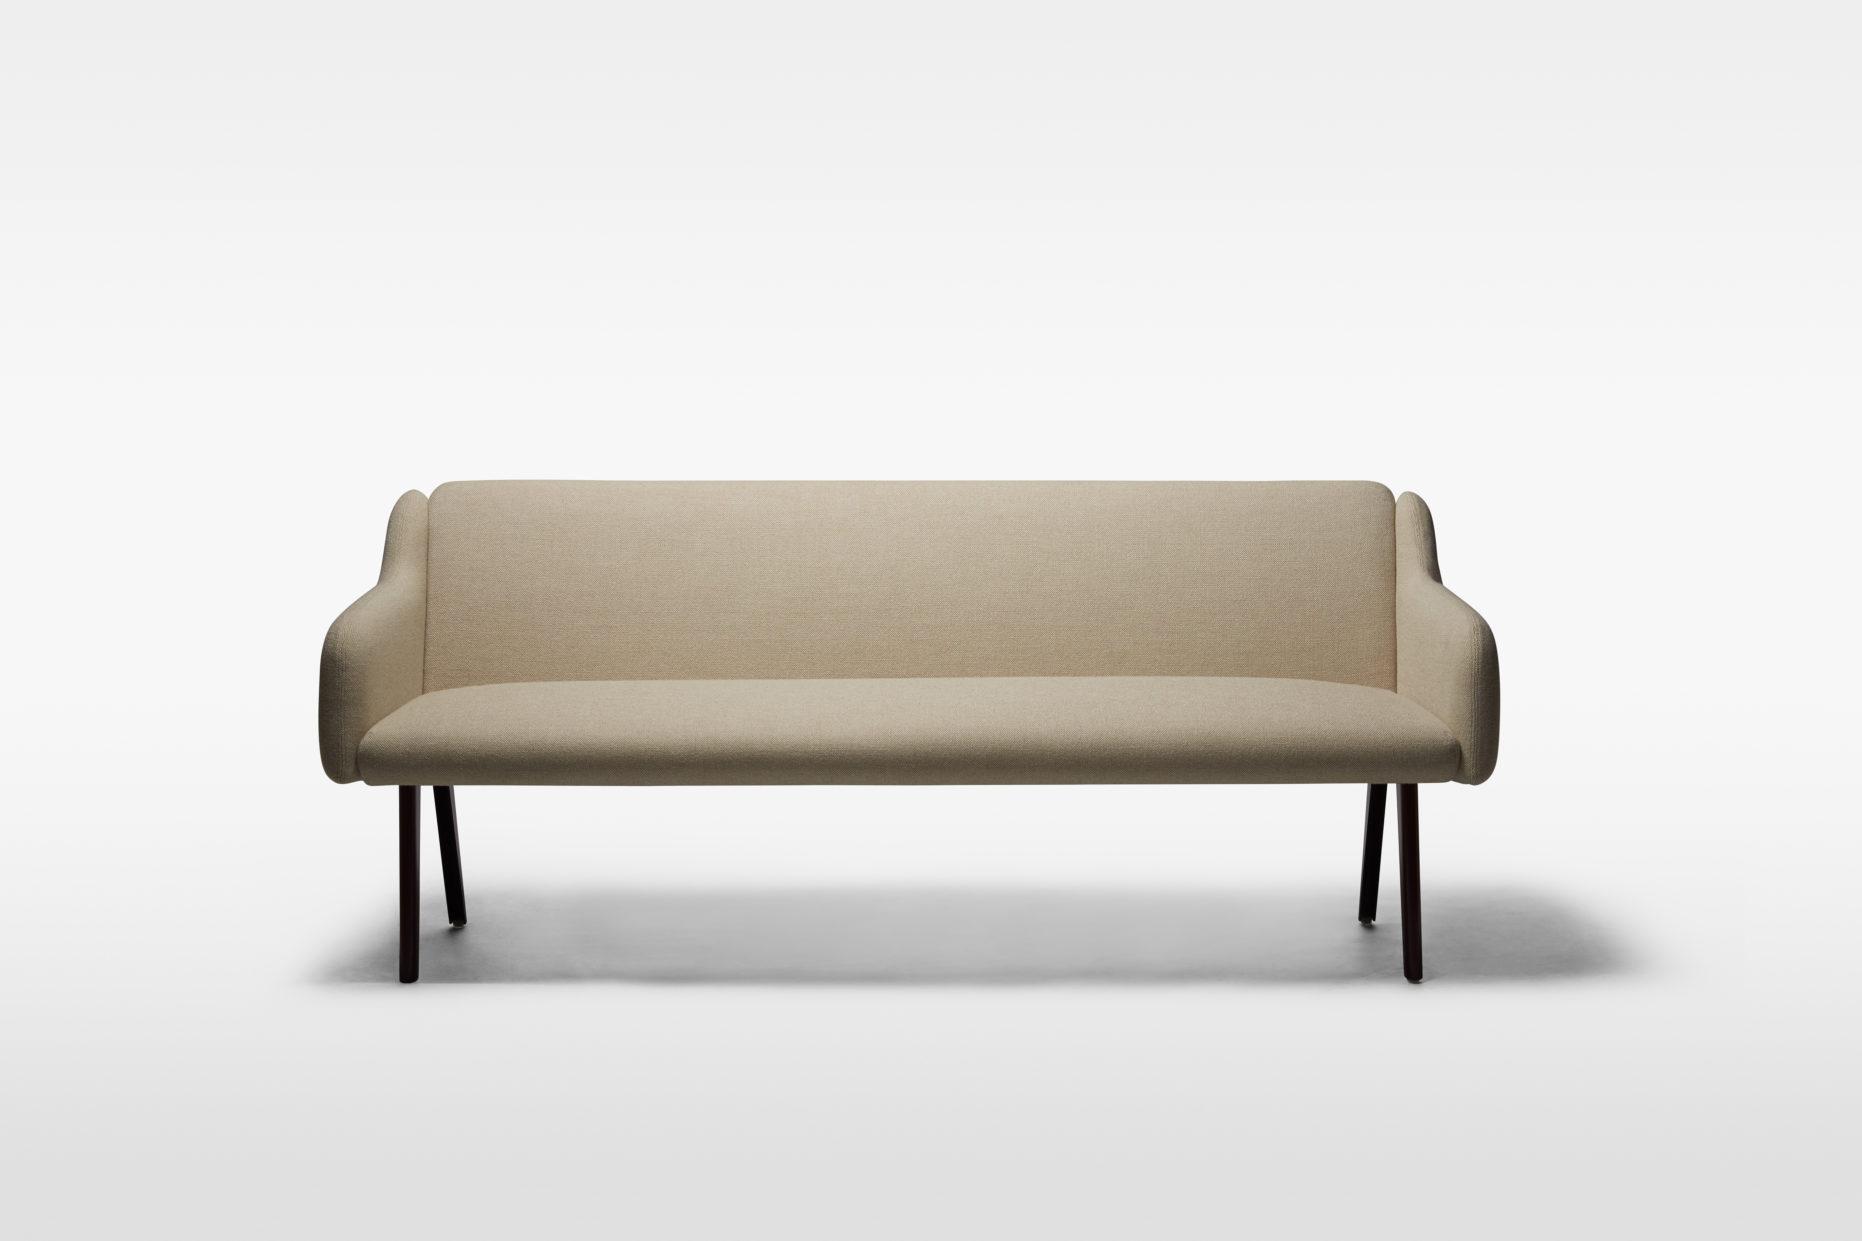 modern low back sofas casa mollino sofa by contemporary designers at haute living